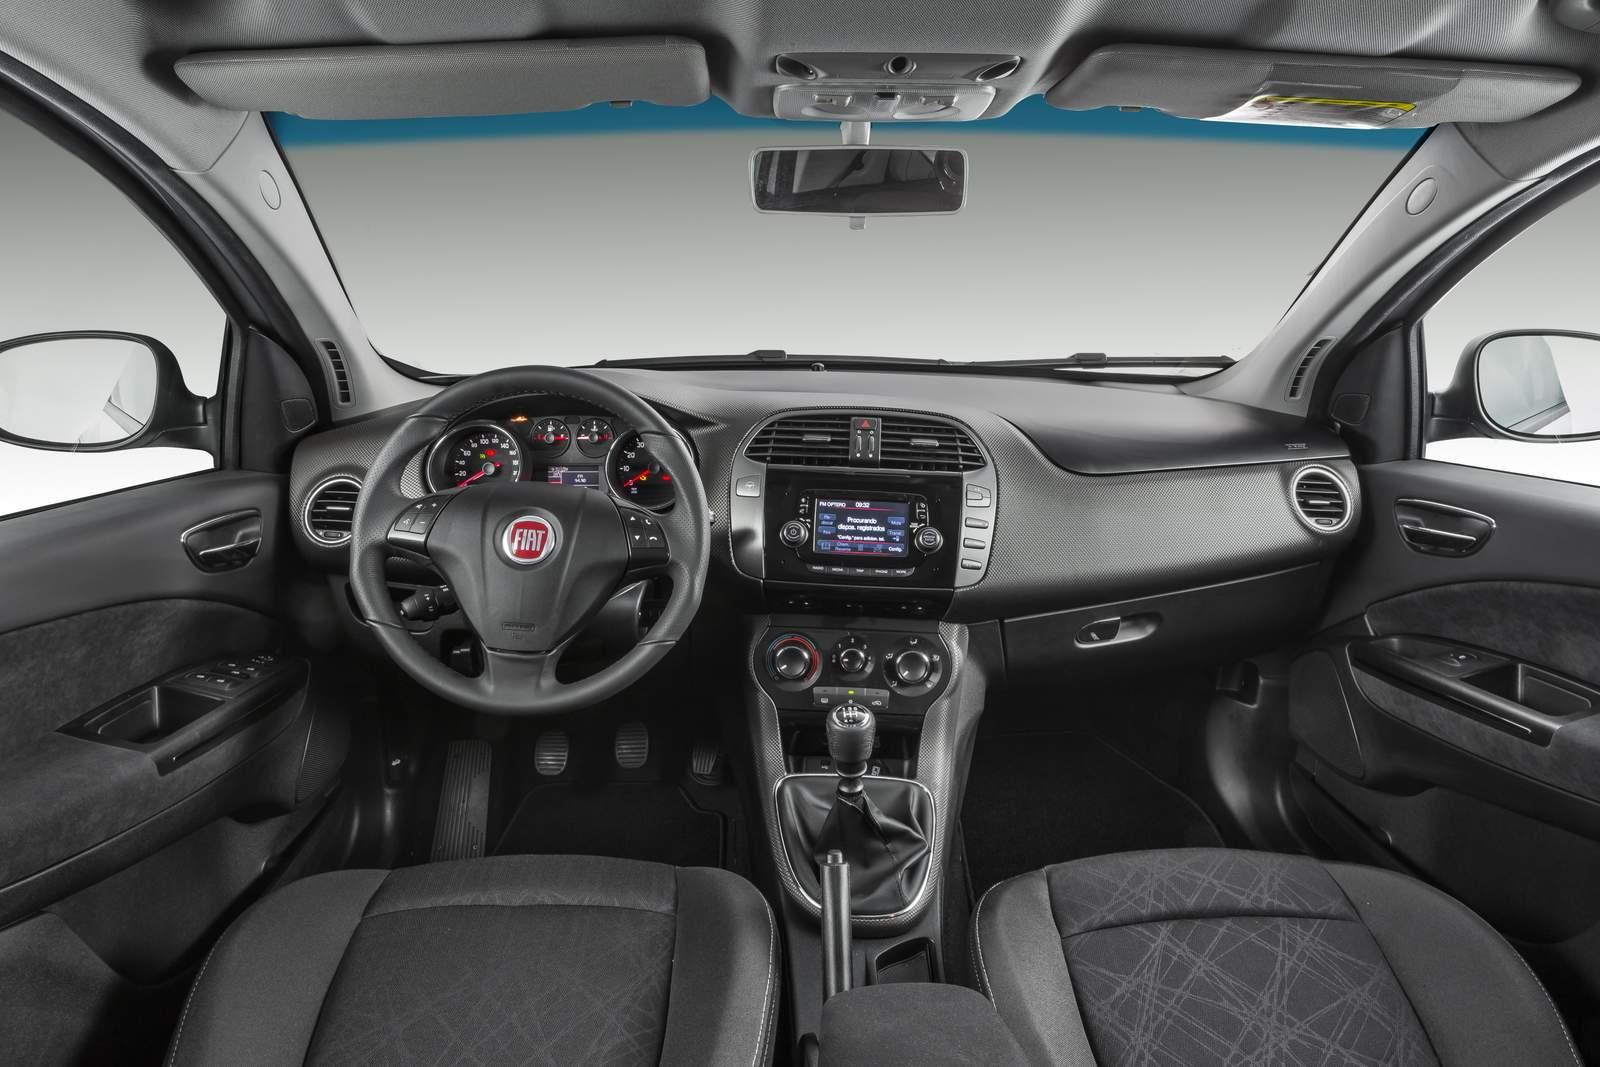 Sobre Fiat Bravo Fiat-Bravo-2016-interior%2B(5)